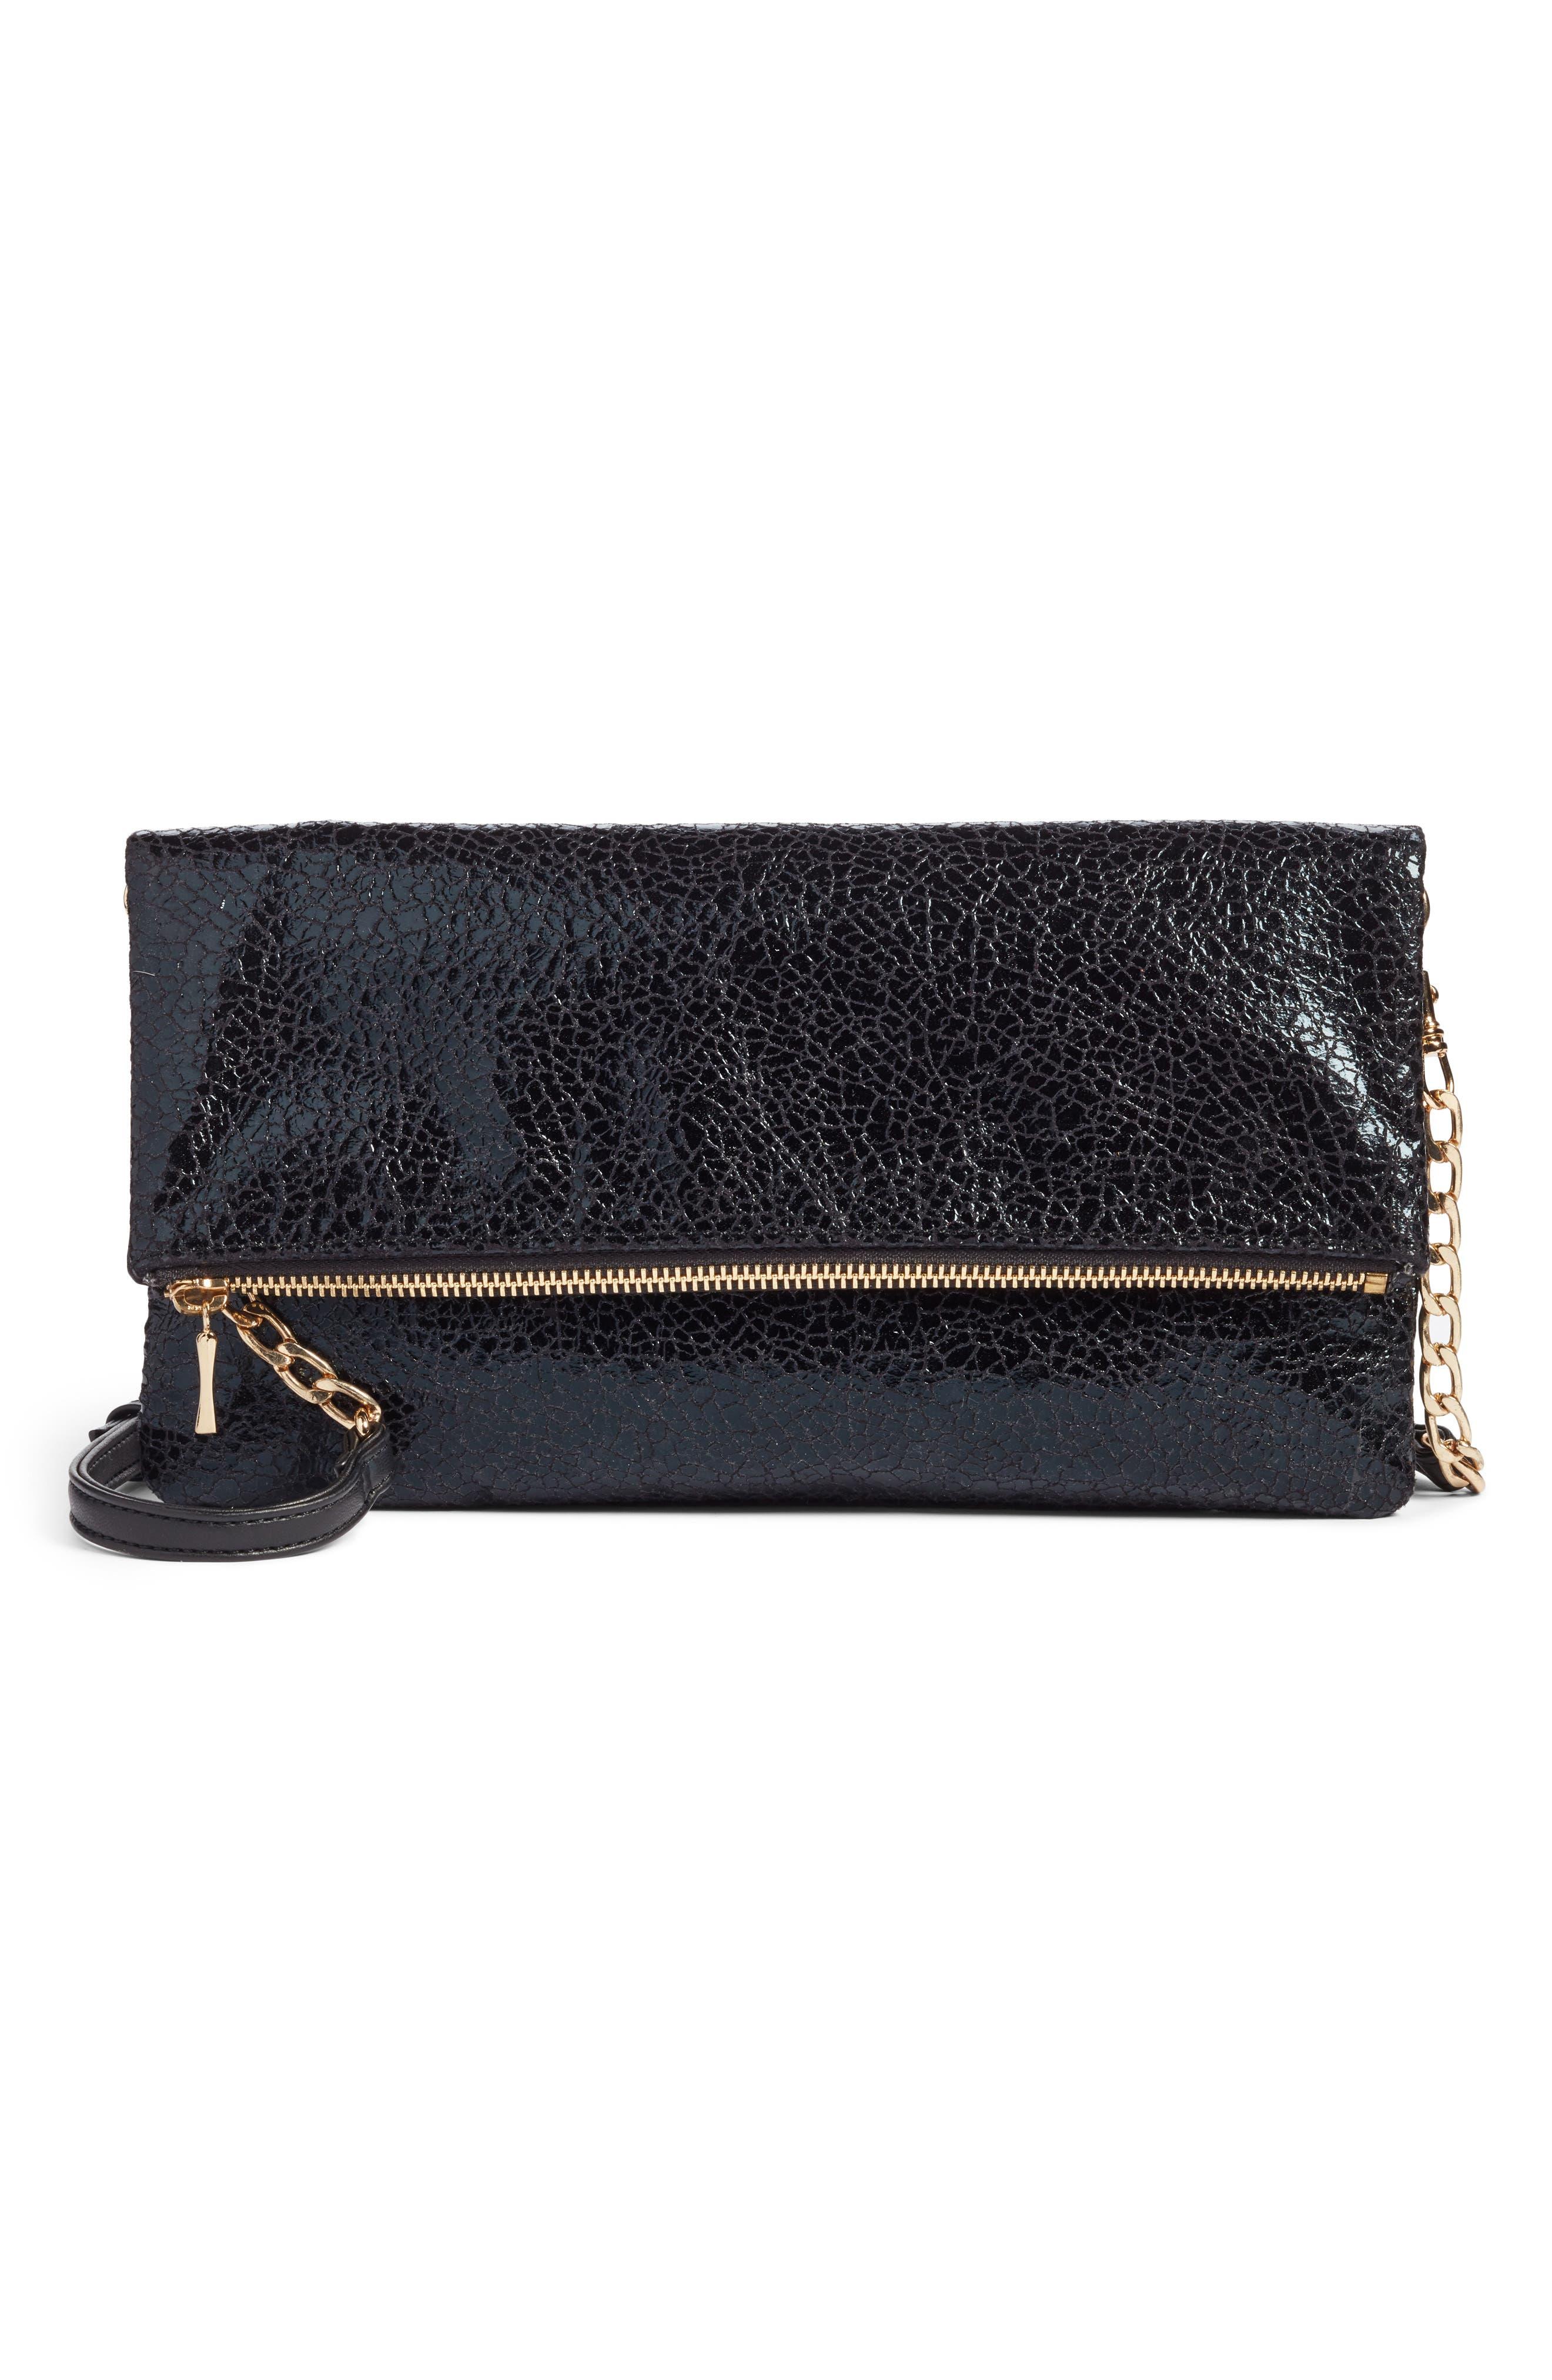 Black Crackle Faux Leather Foldover Clutch,                         Main,                         color, 001